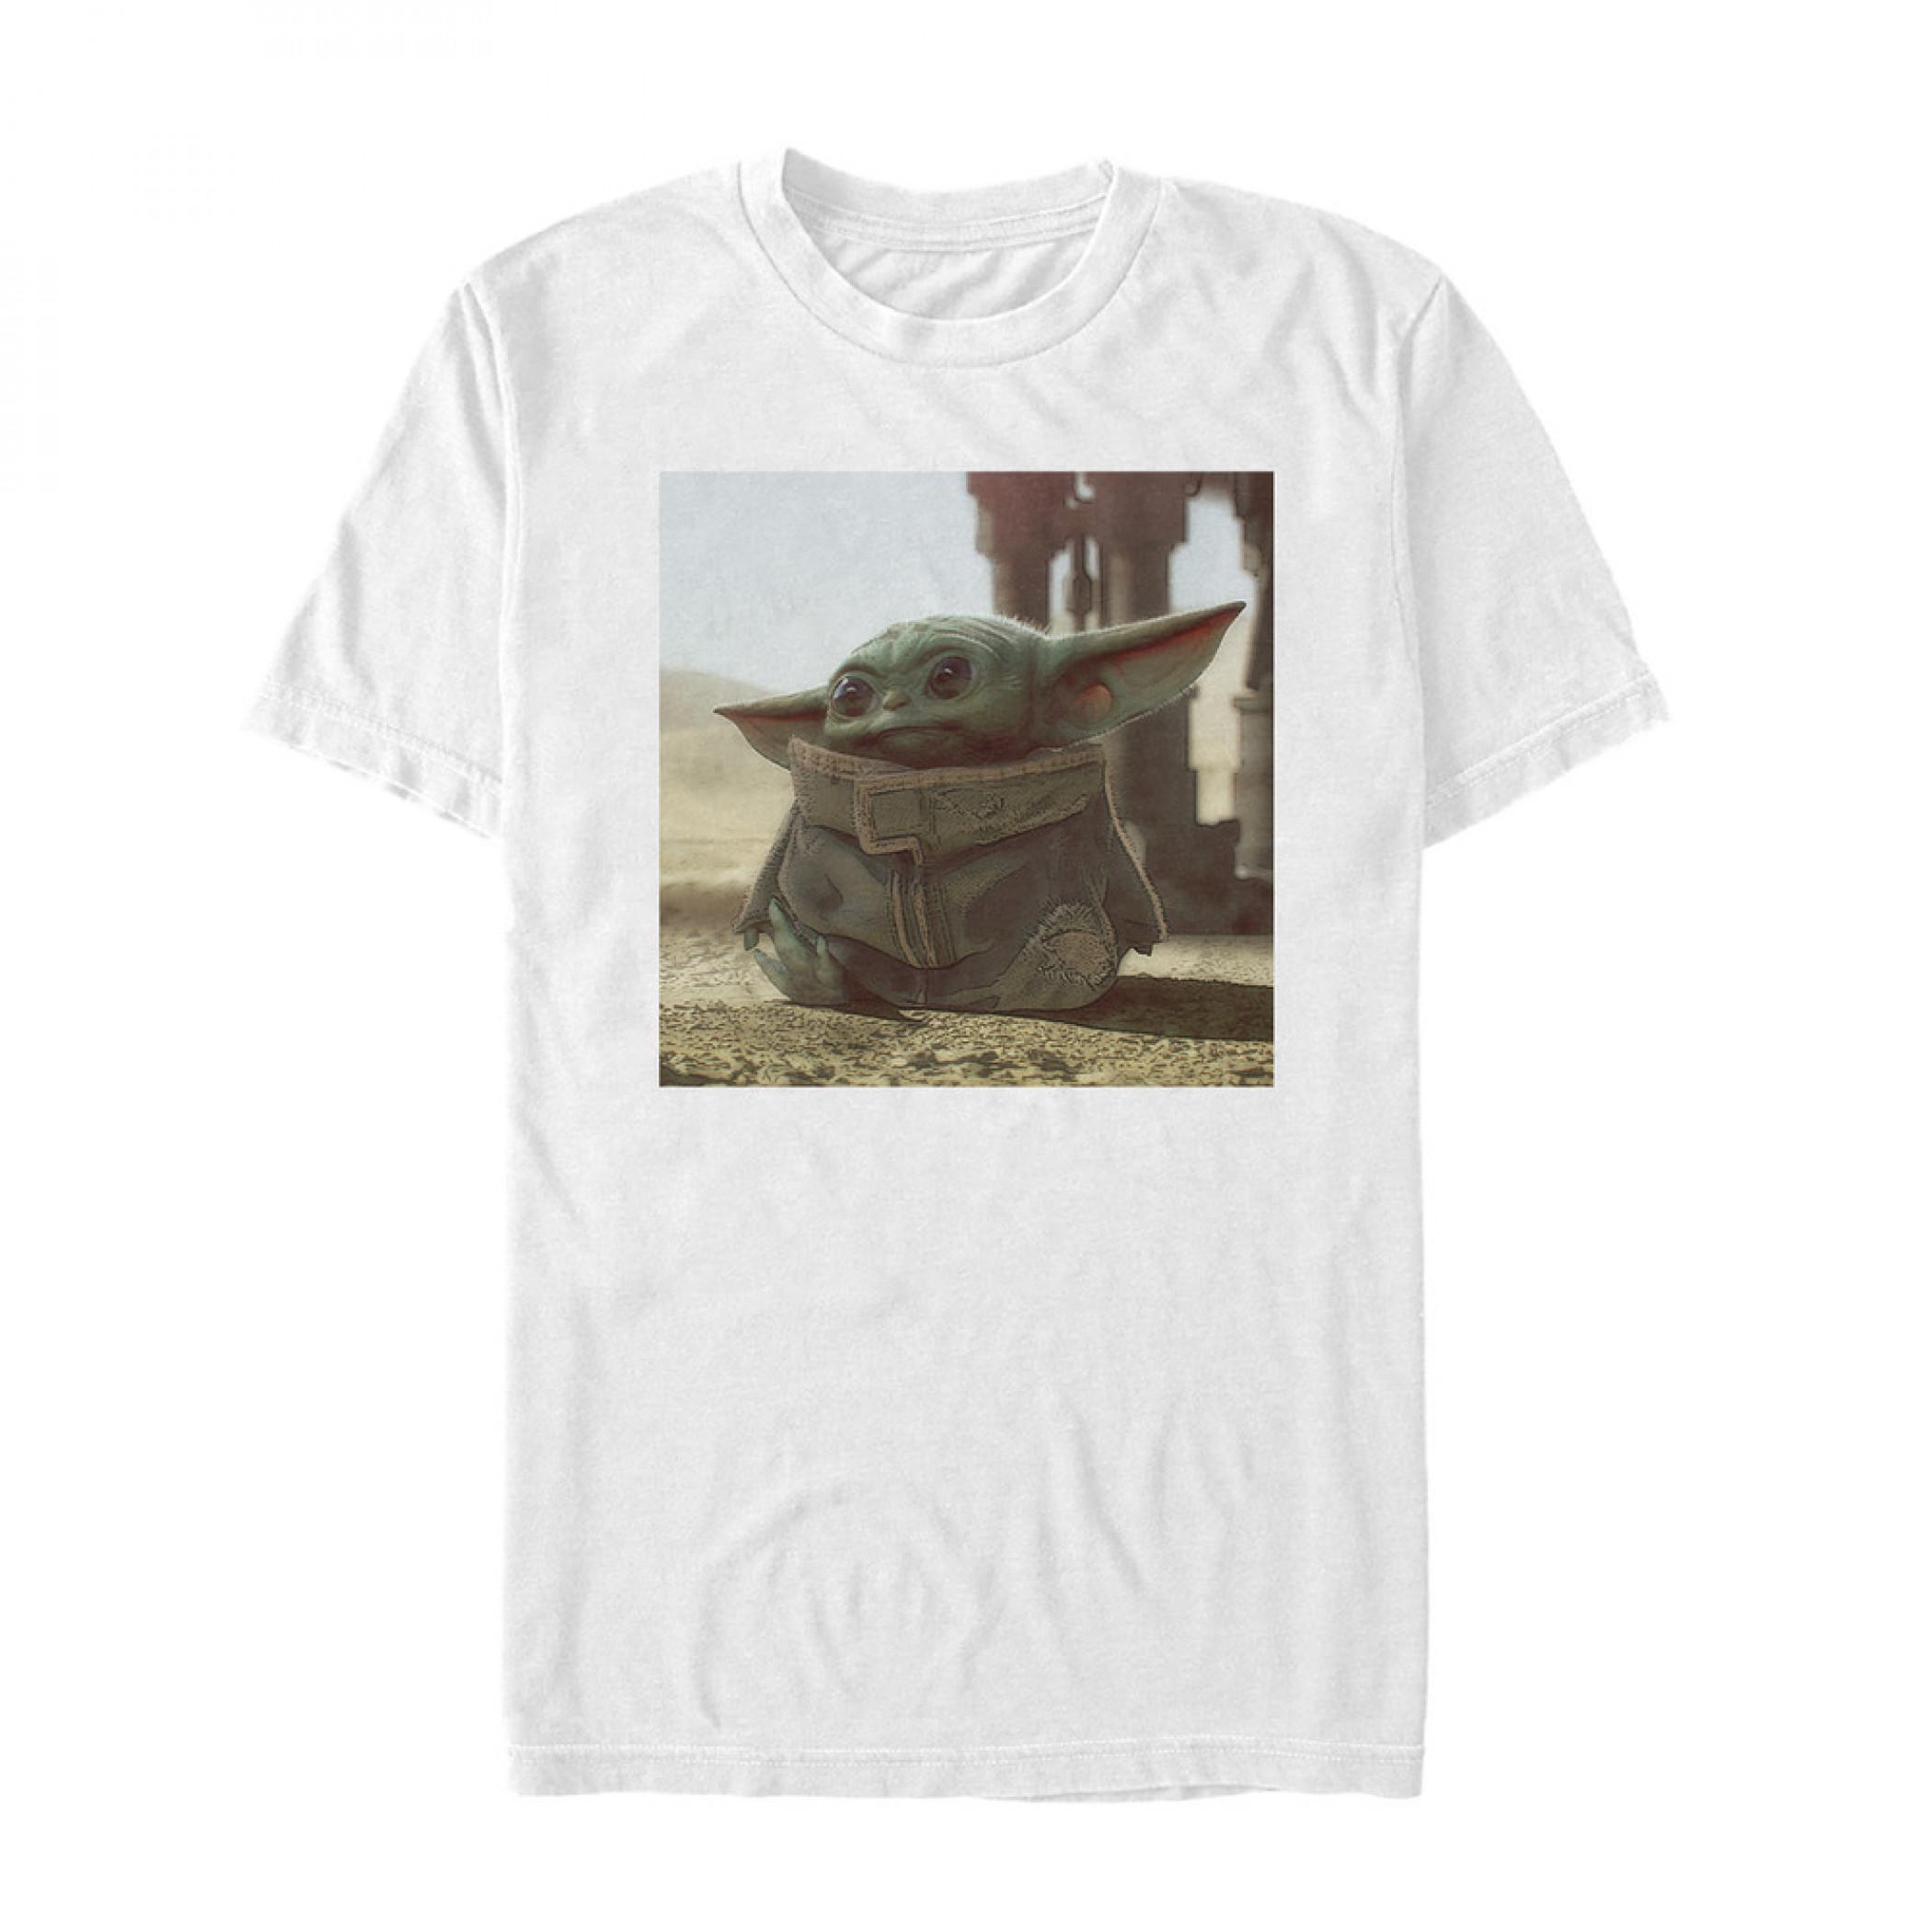 Star Wars The Mandalorian The Child White T-Shirt